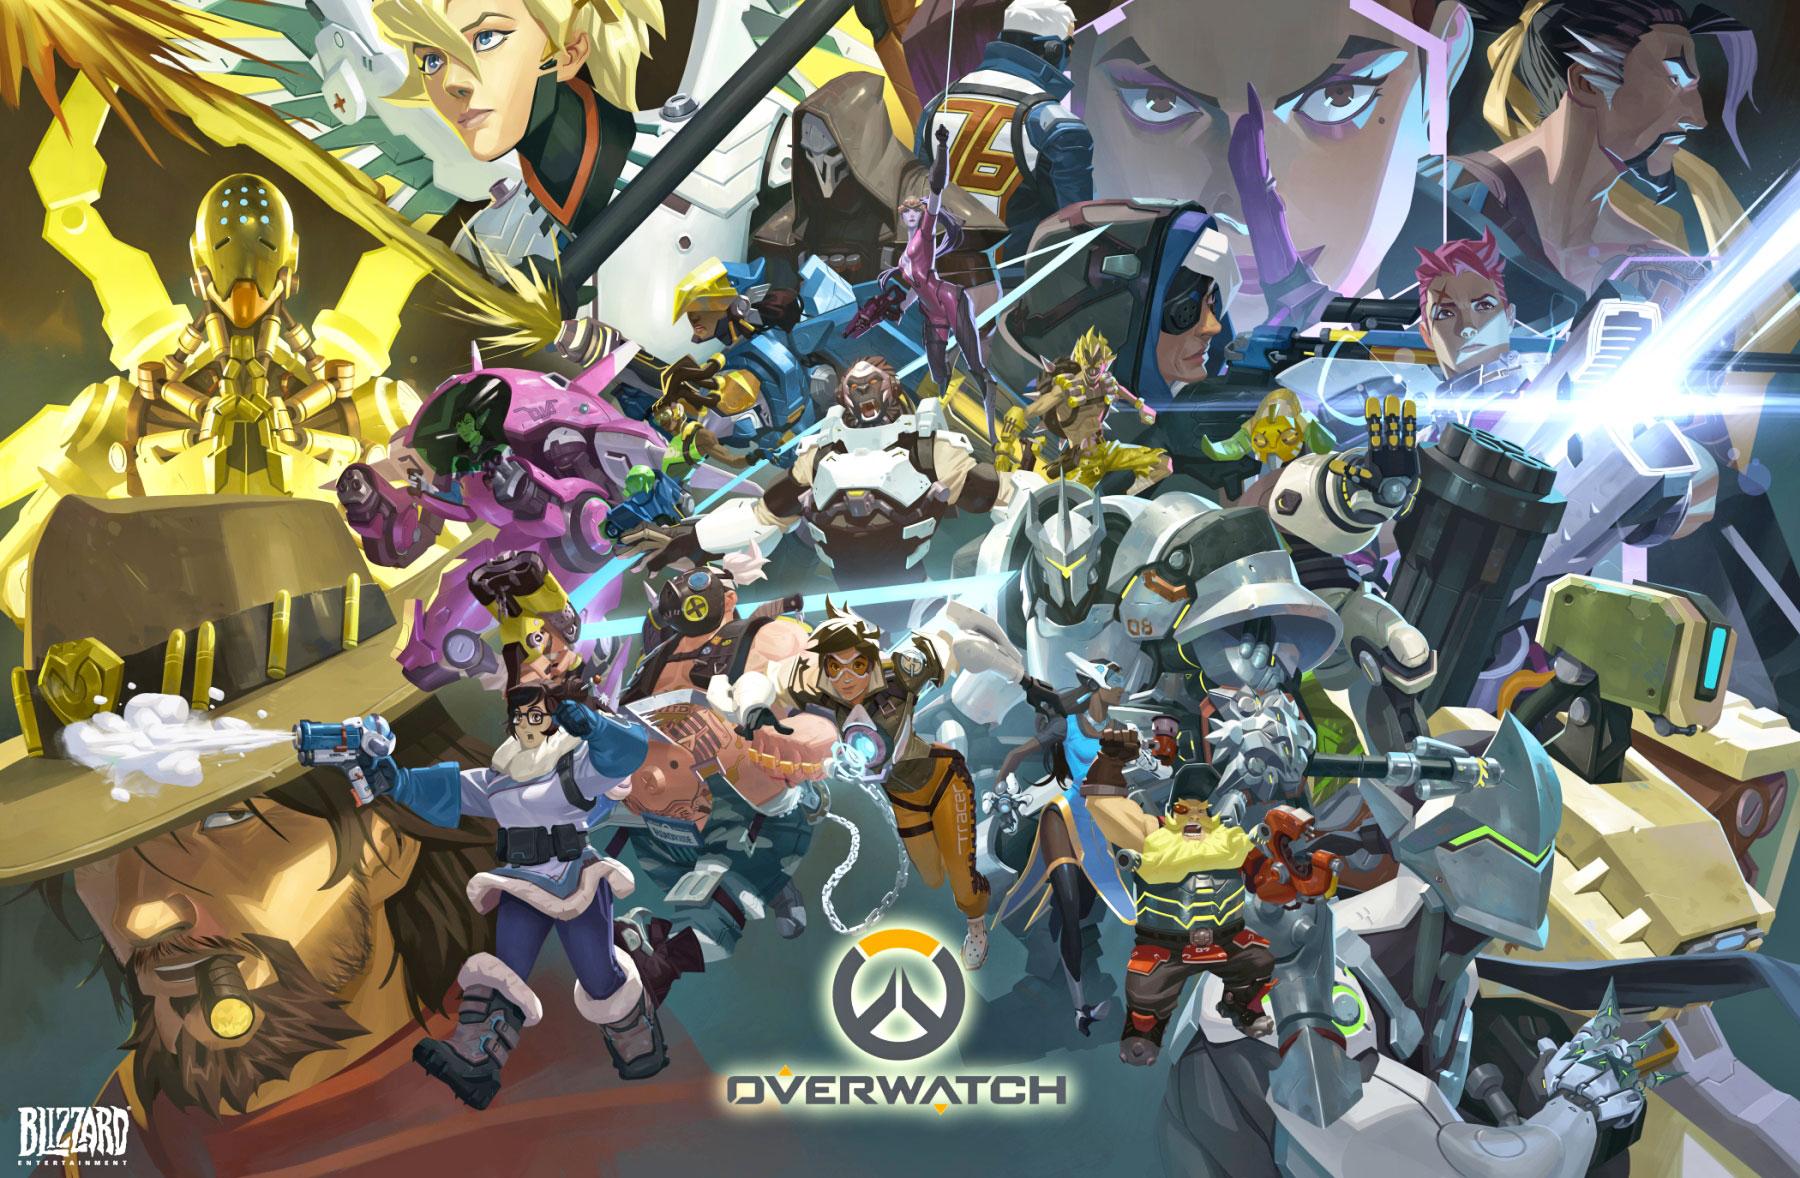 mua game Overwatch